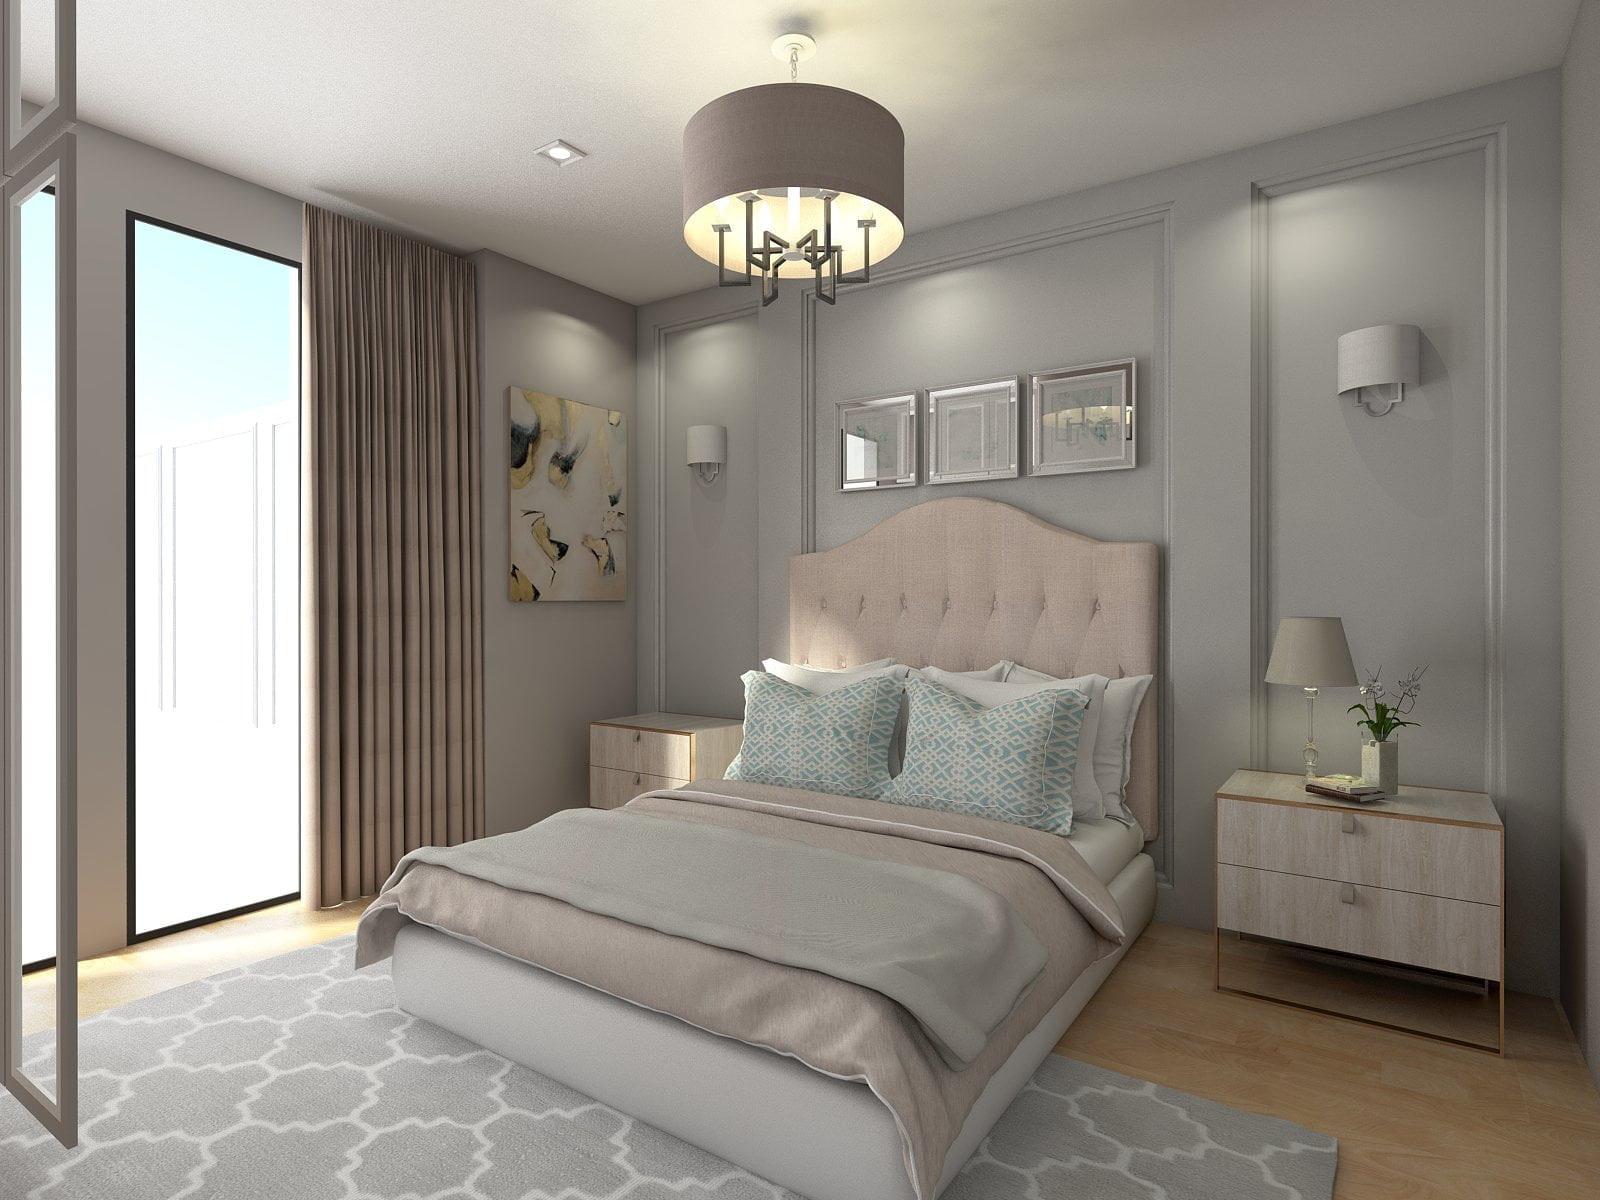 Contact Interior Design, Home Furnishing & Renovation | Laurea 3